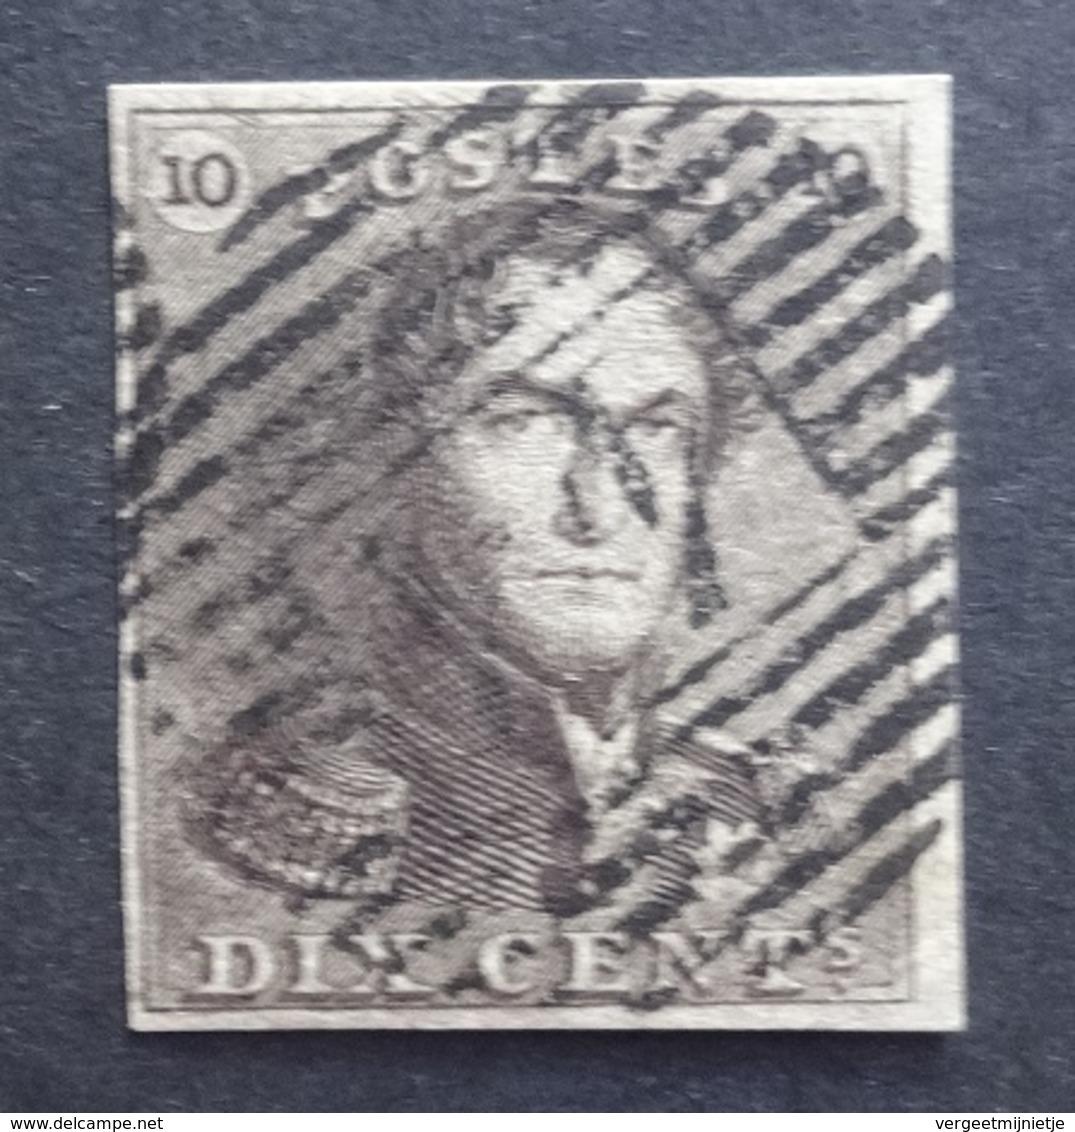 BELGIE  1849   Nr.  1 E    Goed Gerand / Centraal Gestempeld  P 44  - Coba 40     CW  160,00 - 1849 Epaulettes